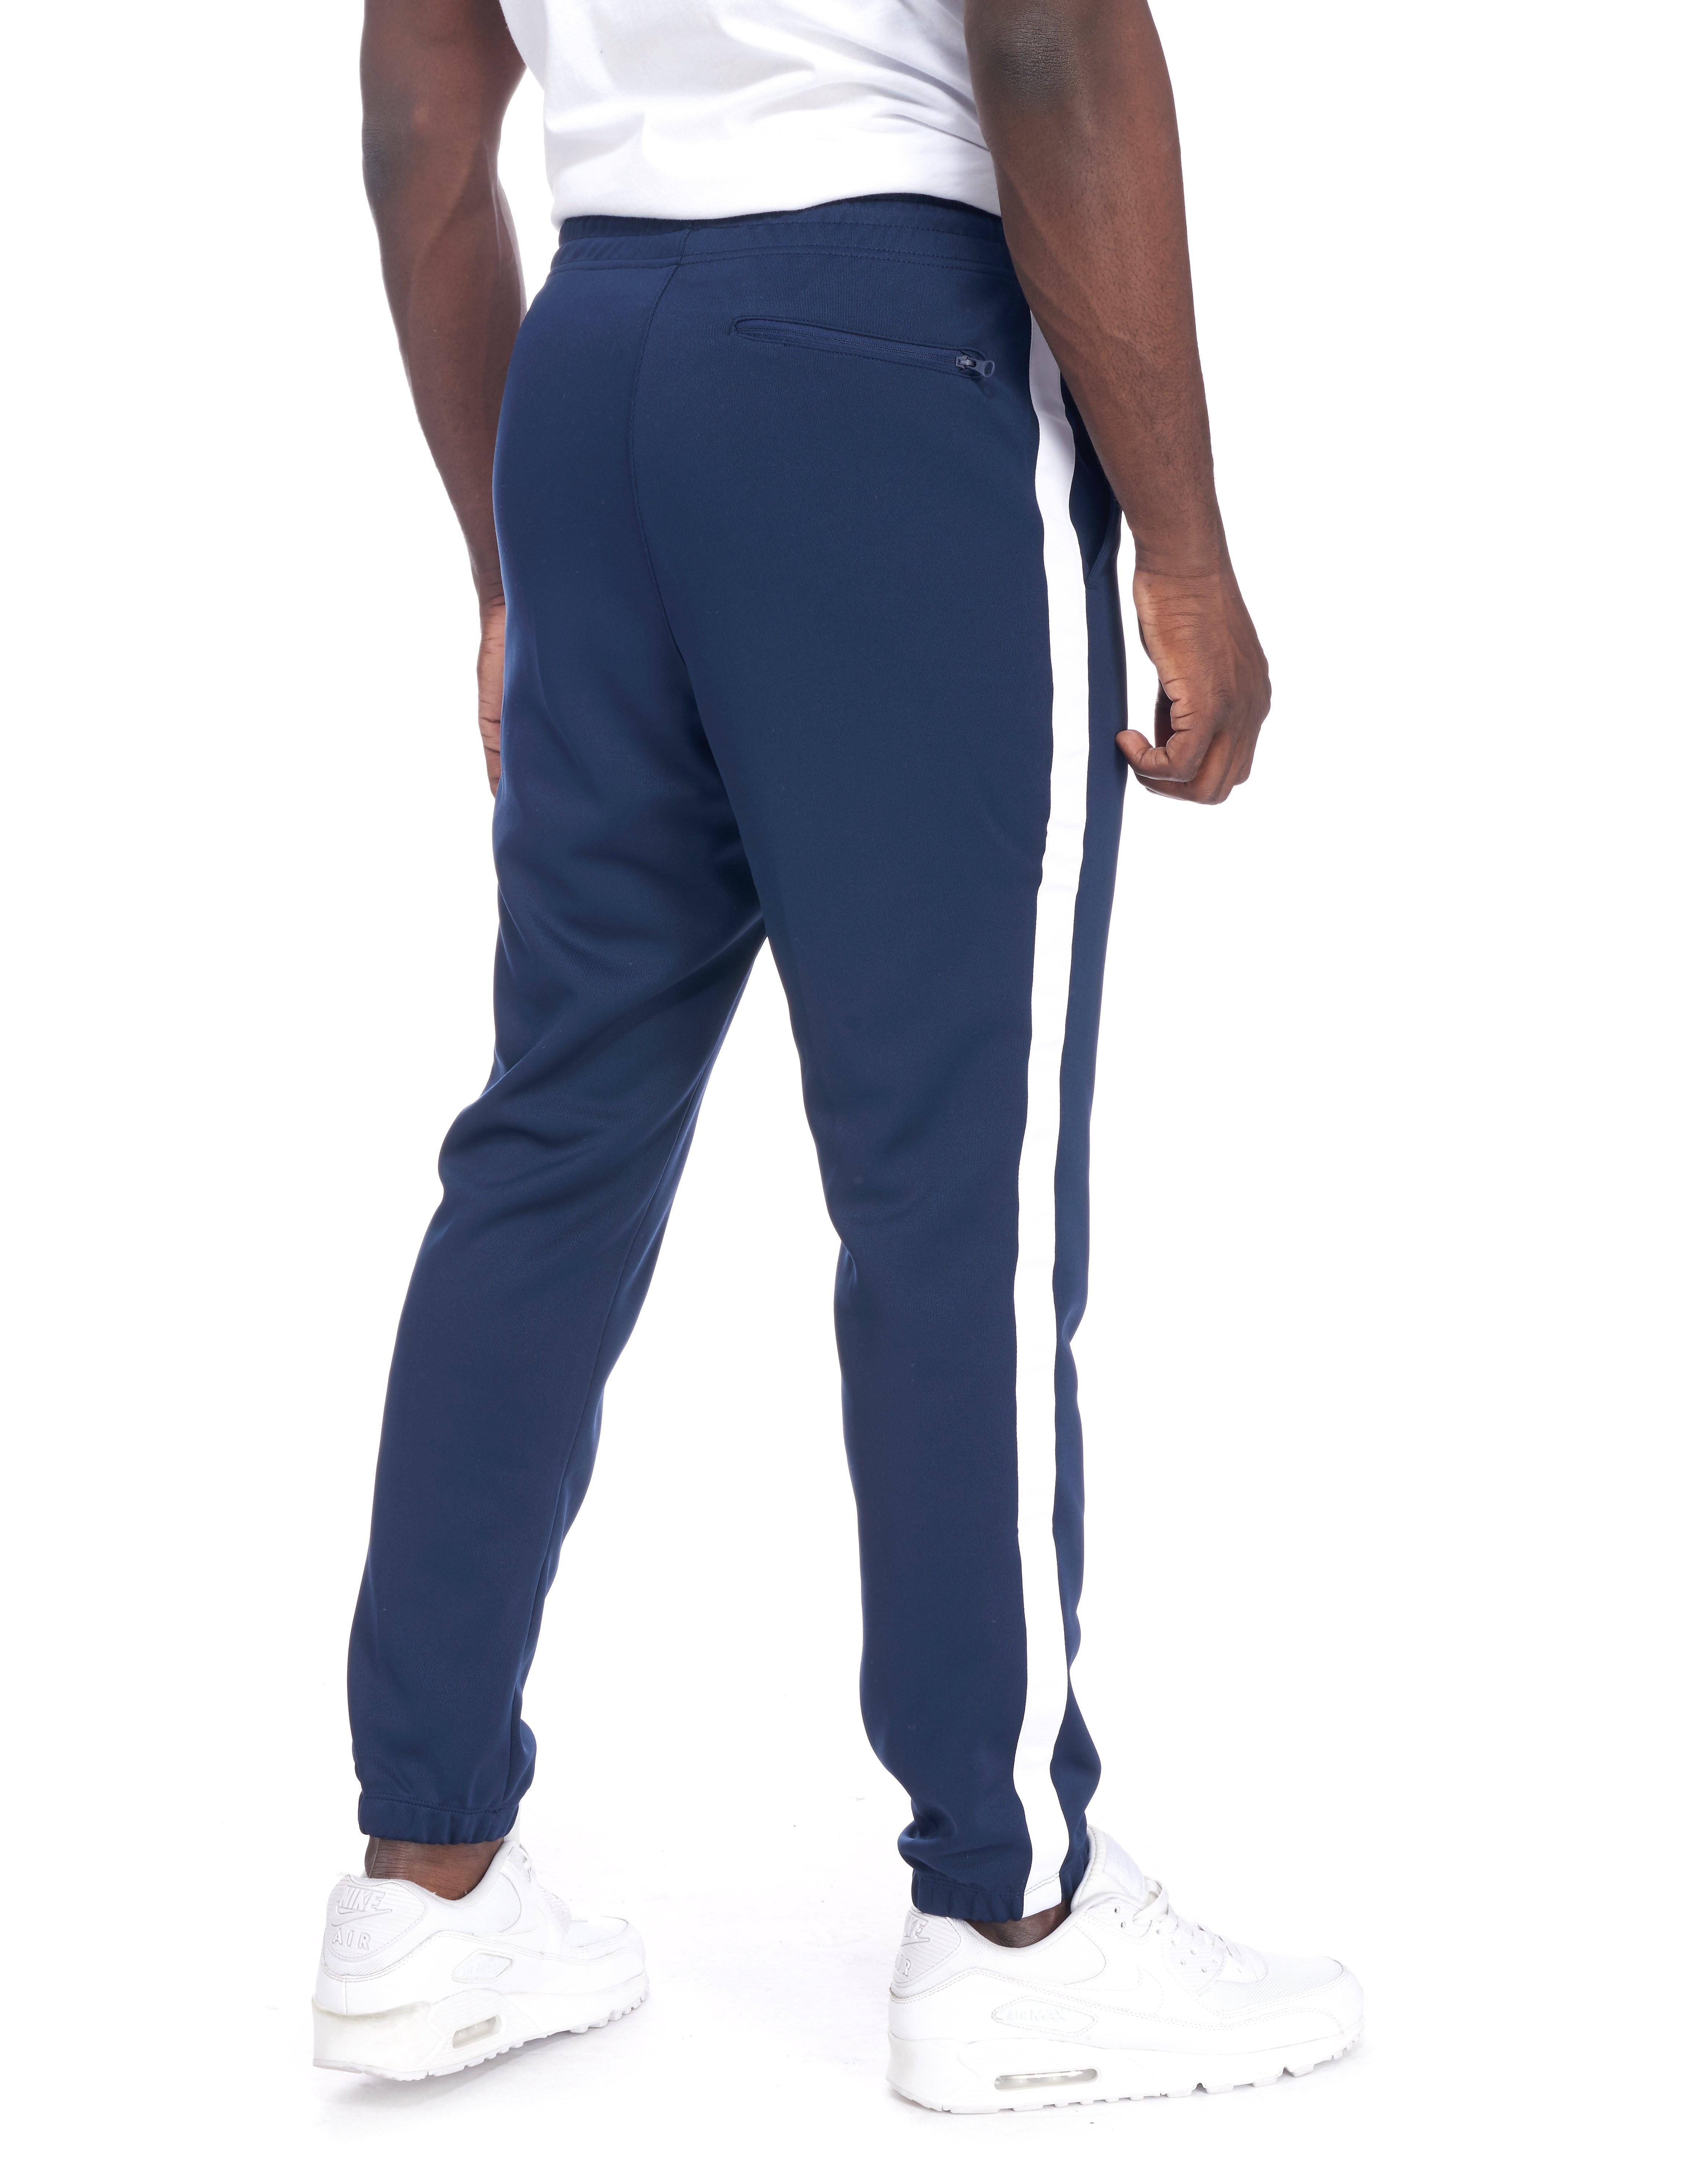 Nike Limitless Poly byxor